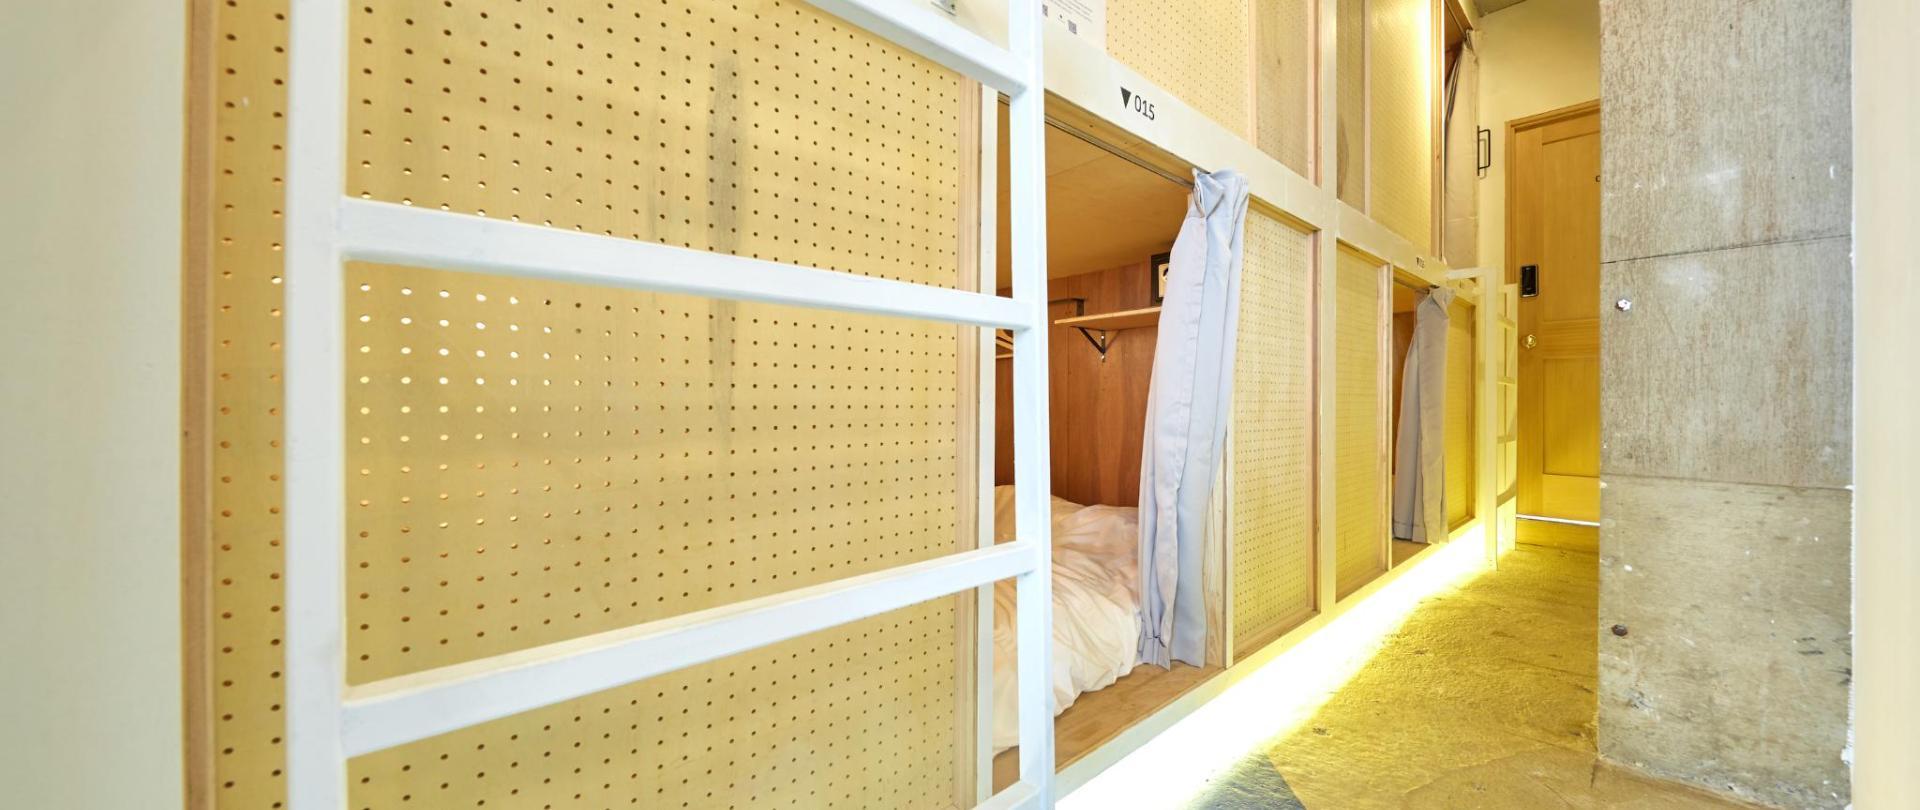 Shimokitazawa Hostel